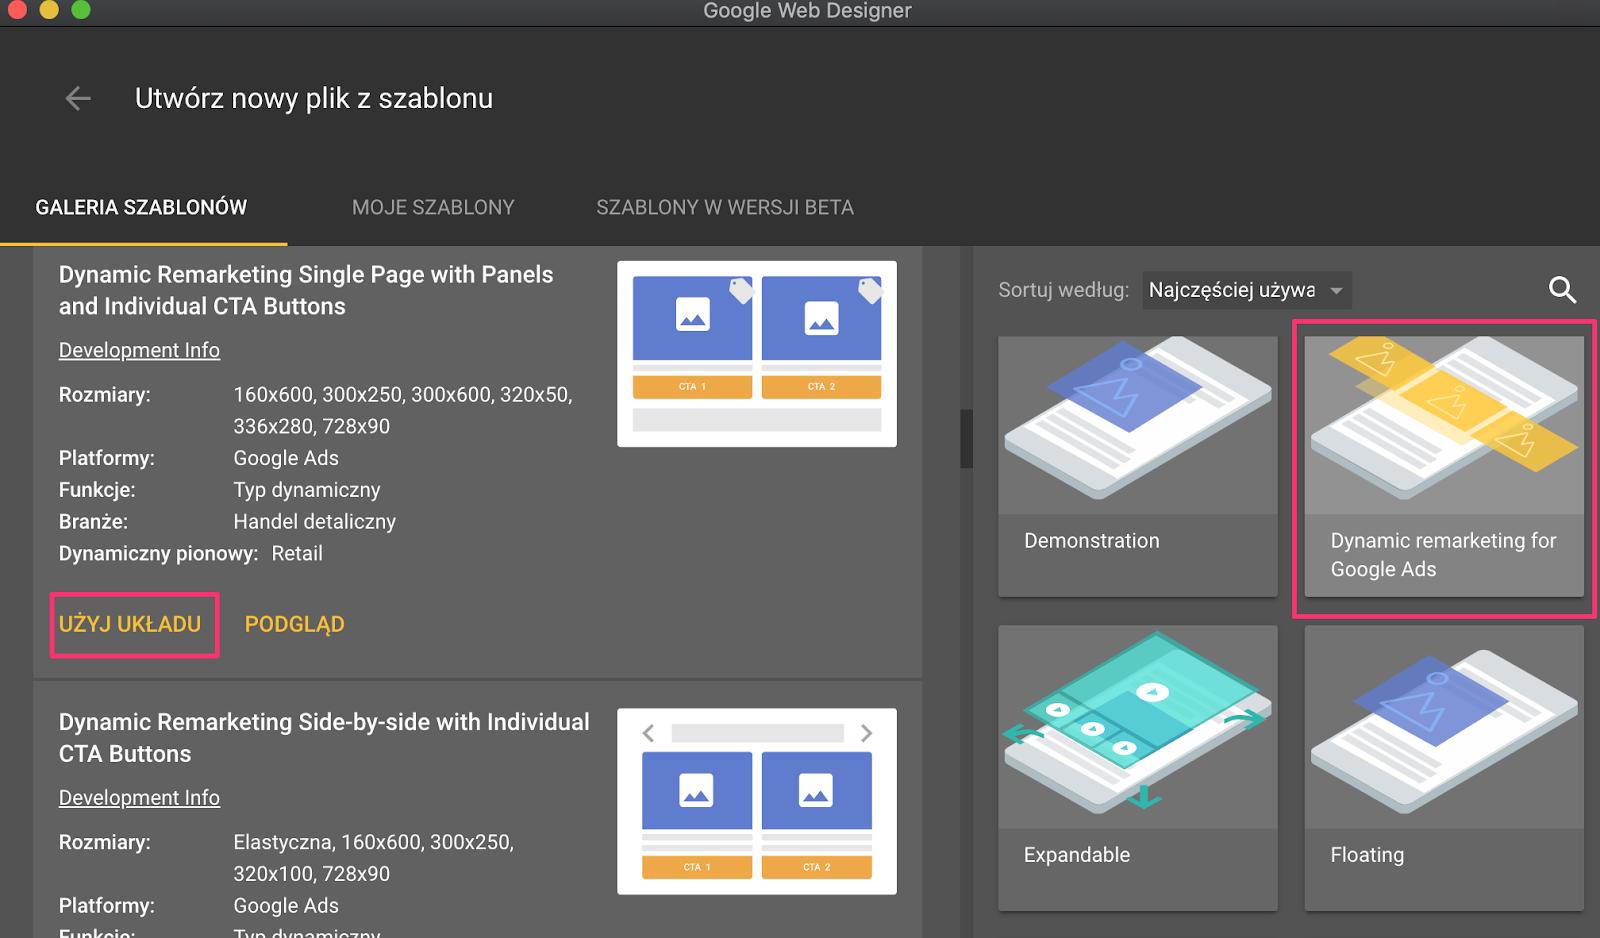 Rys.2. Szablony reklam w Google Web Designer